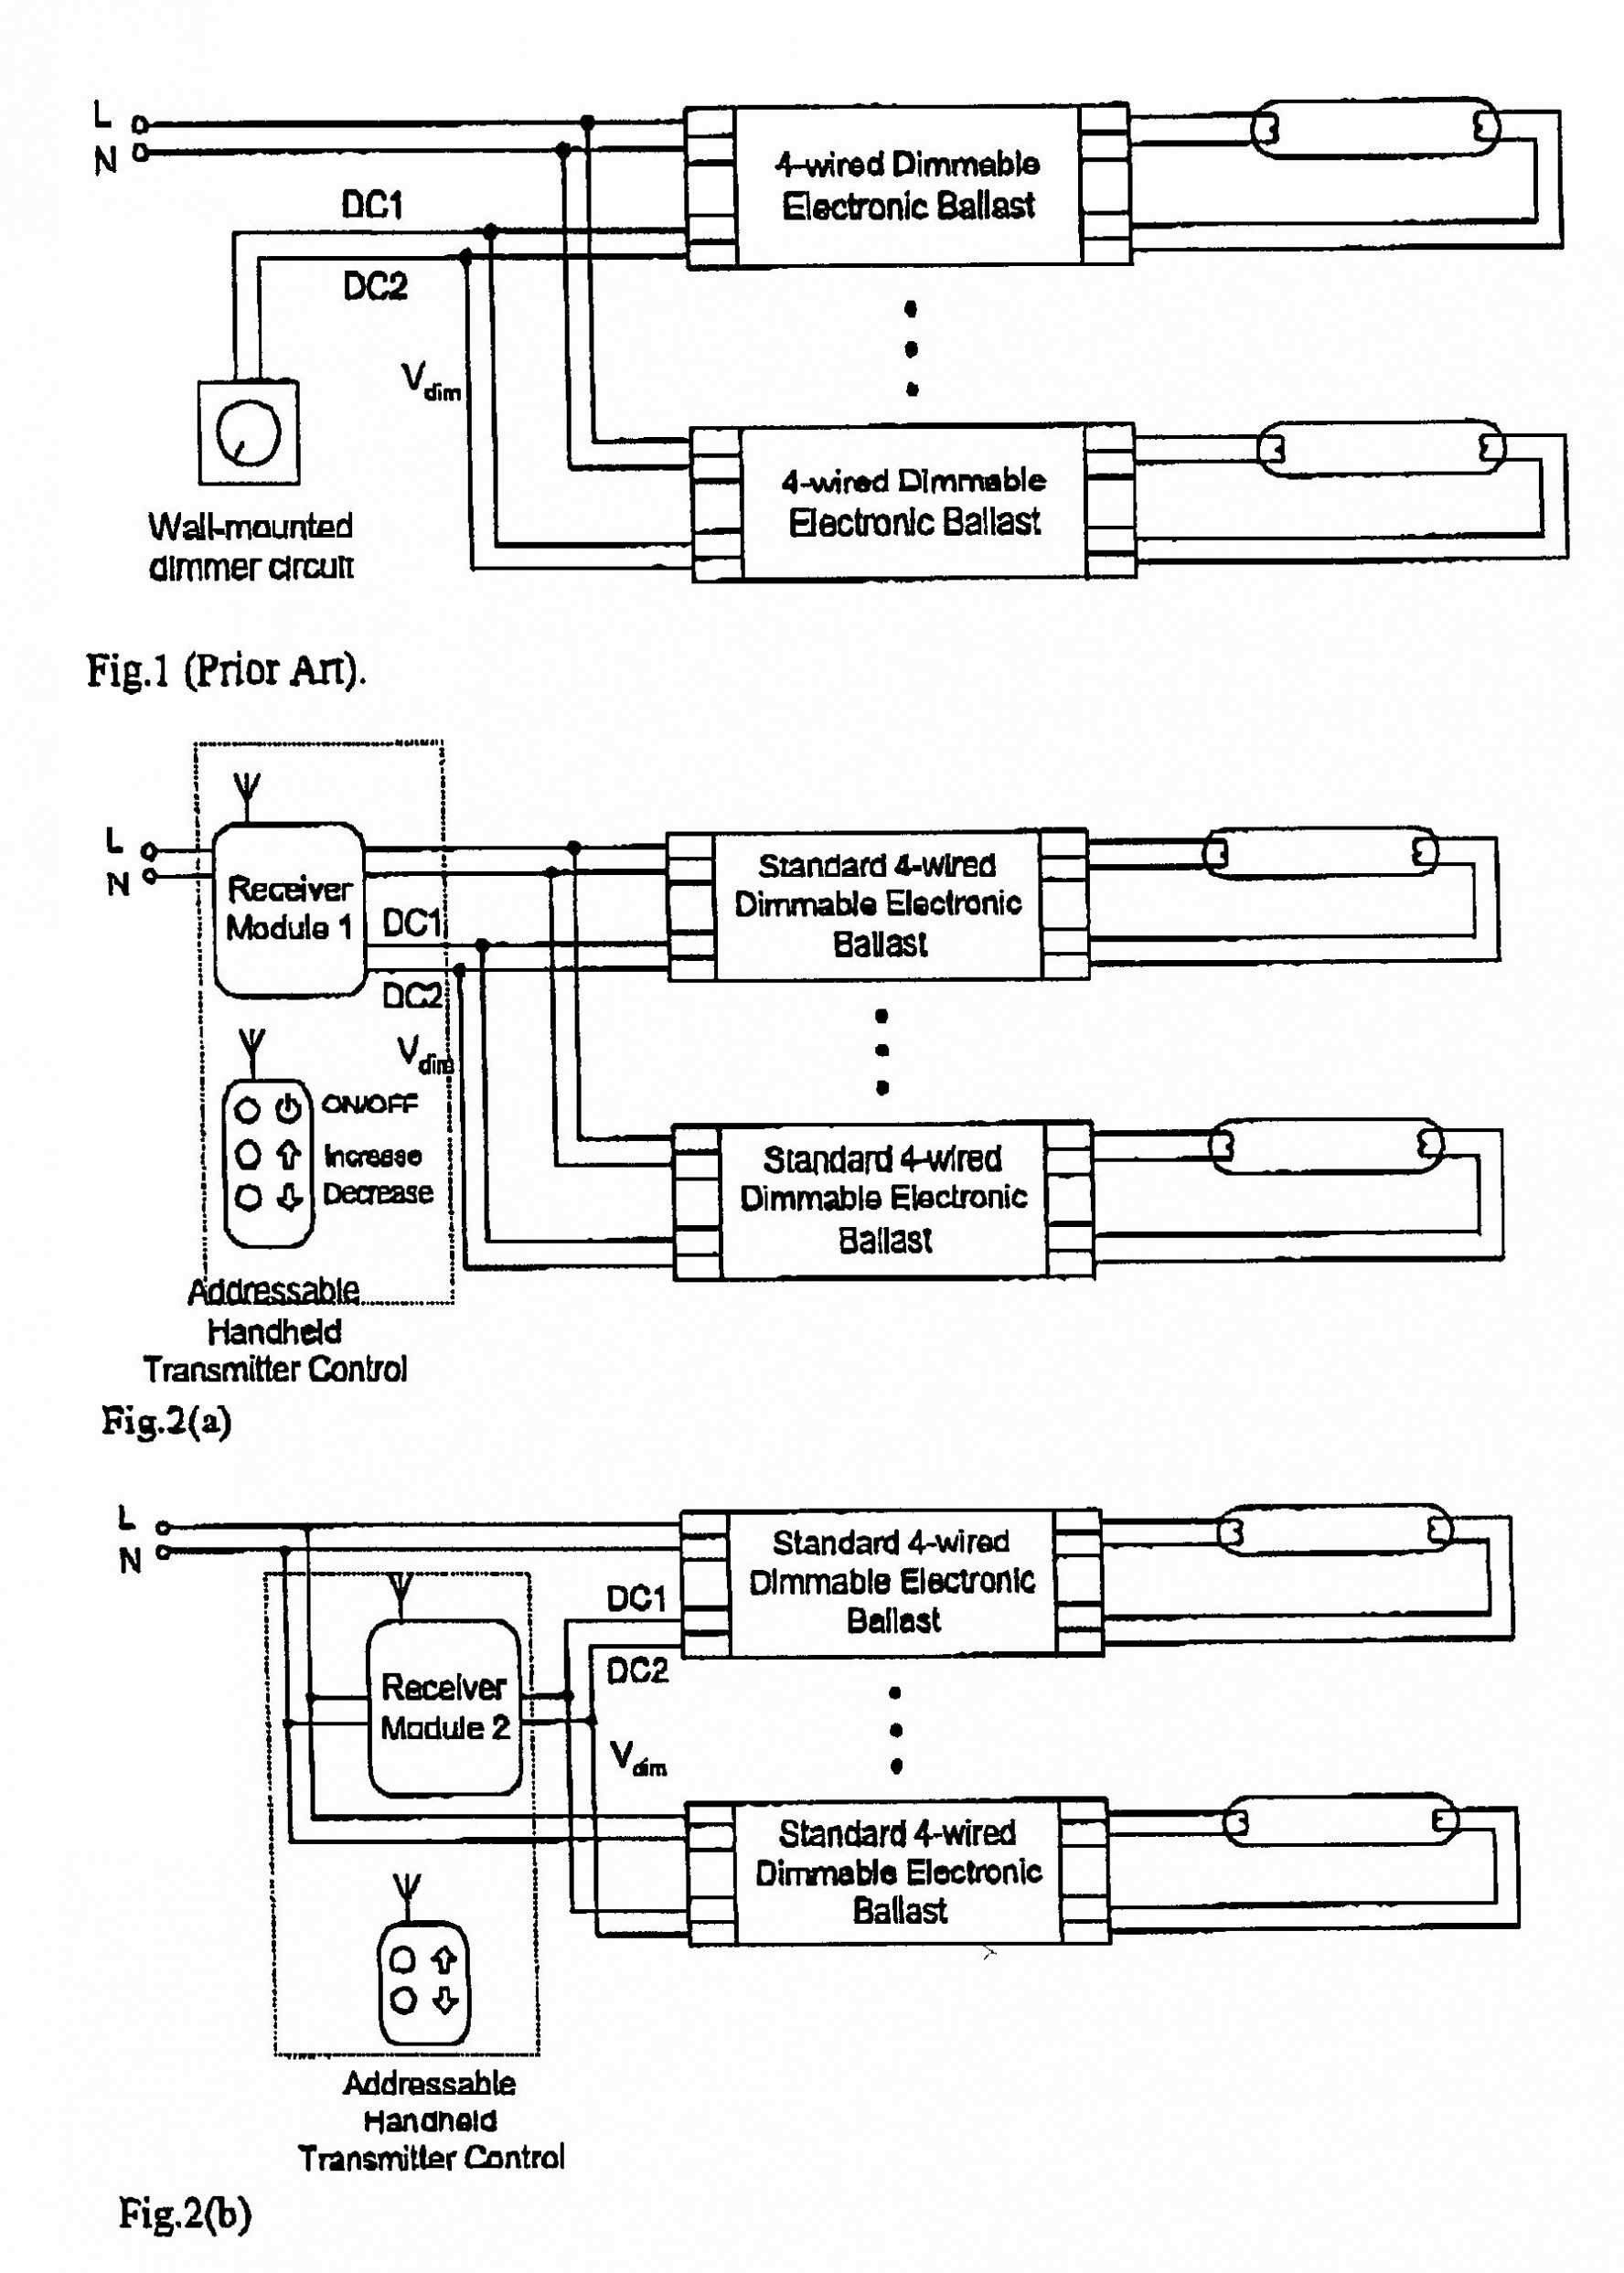 Philips Advance Ballast Wiring Diagram Recent 2 Lamp T8 Ballast Wiring Diagram